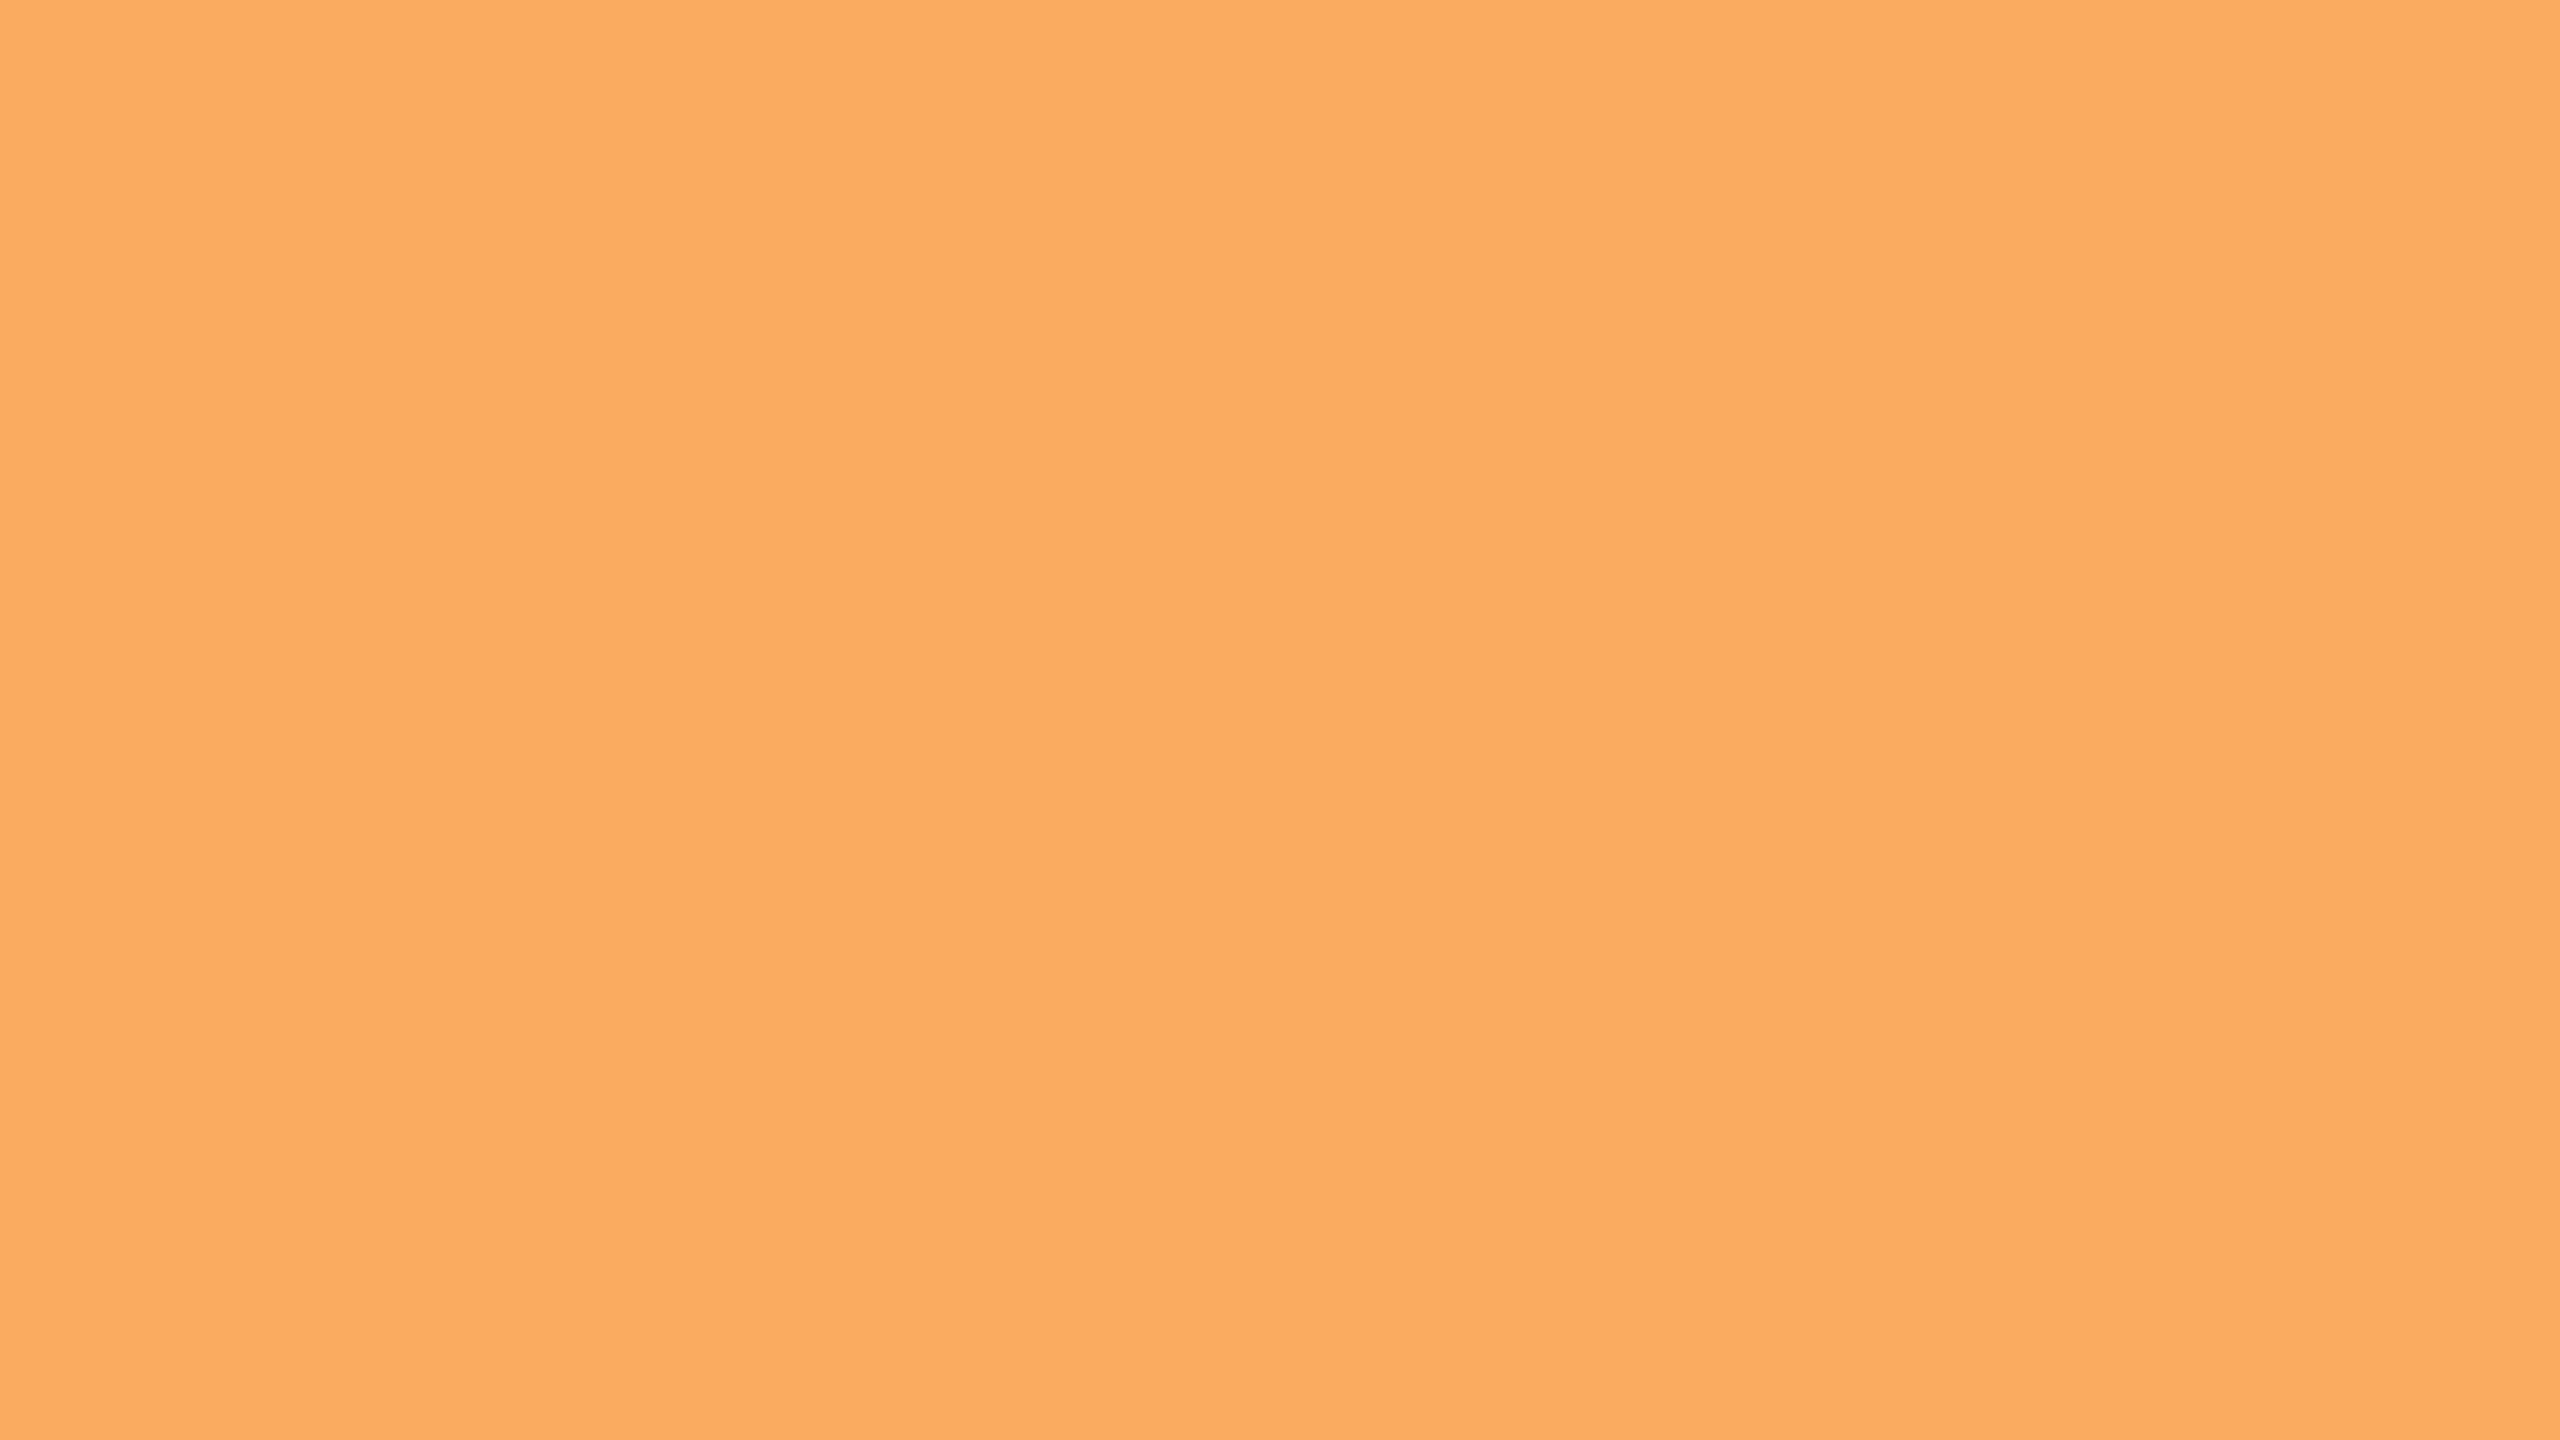 2560x1440 Rajah Solid Color Background